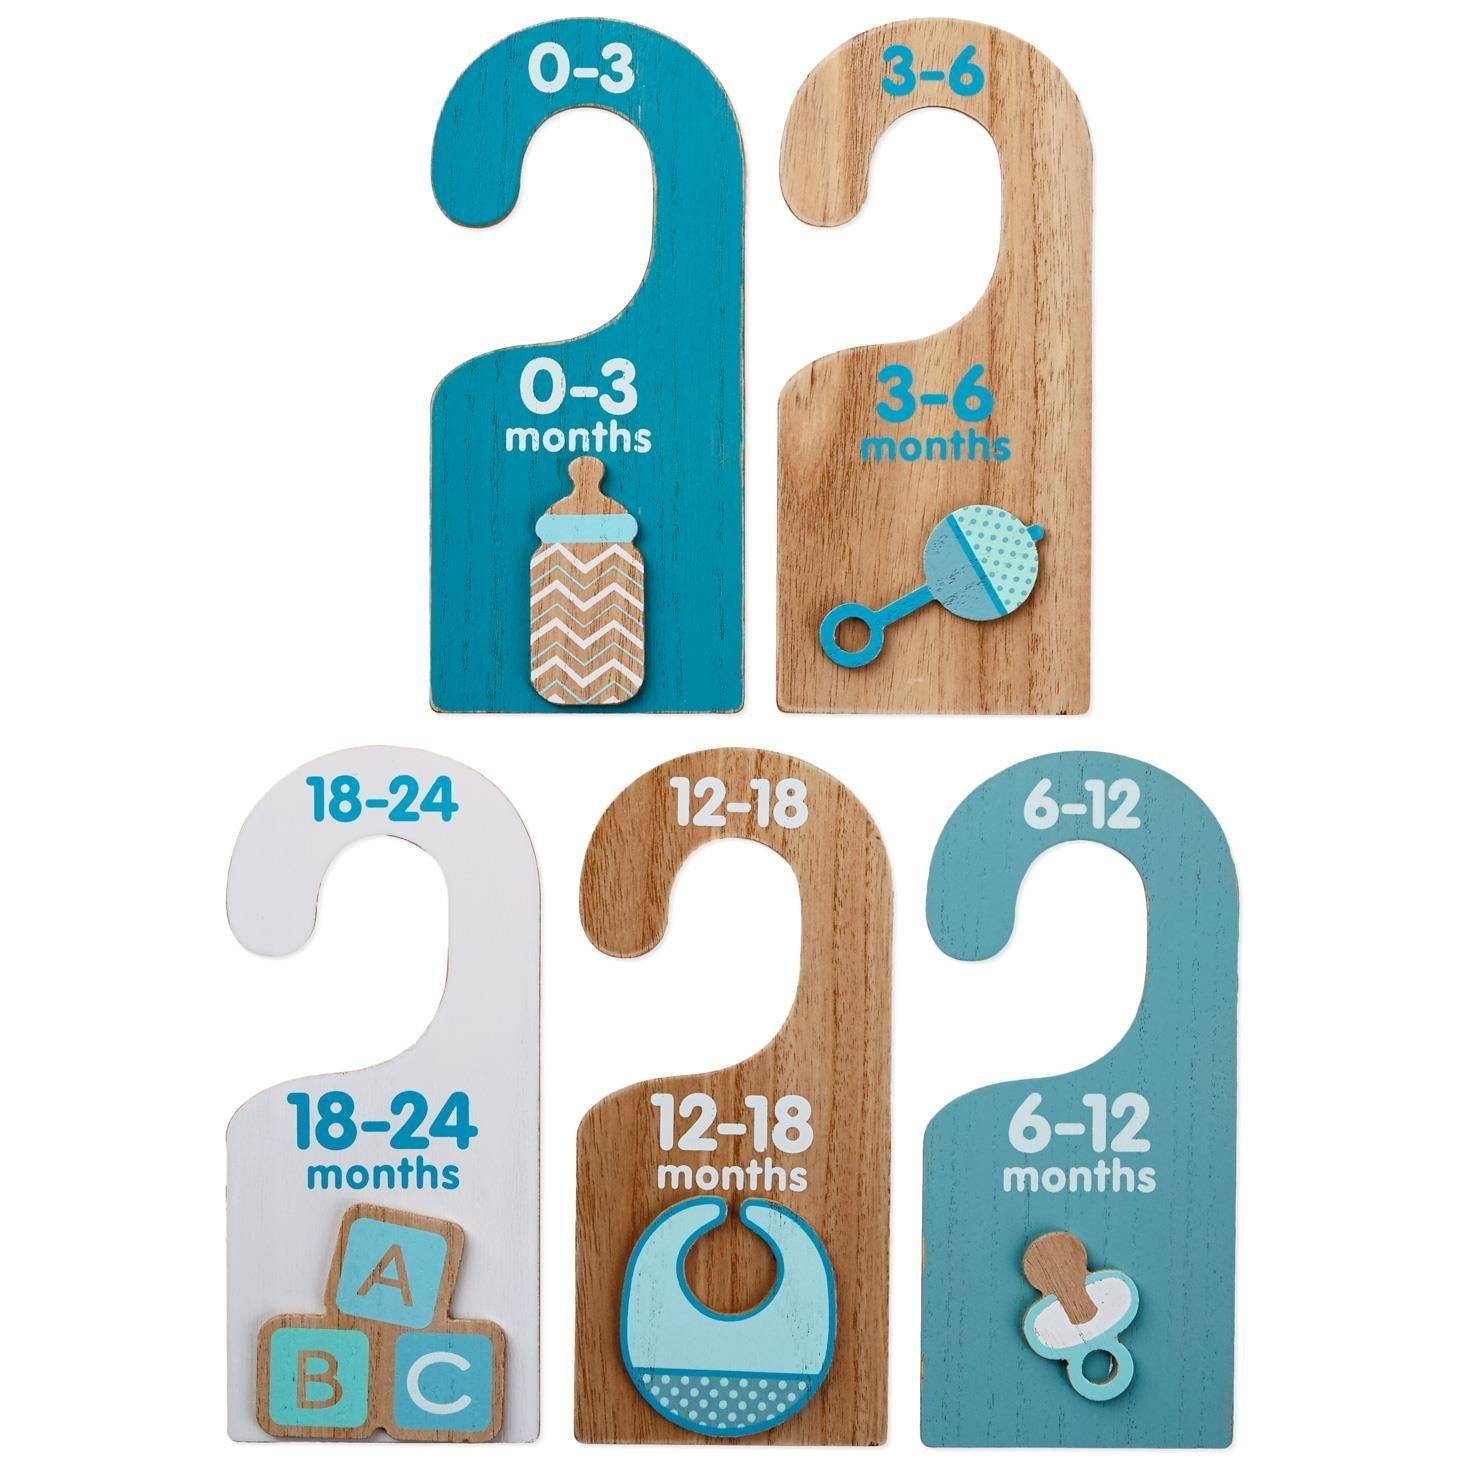 Hallmark Baby Essentials Wood Hanger Dividers for Boys, Set of 5